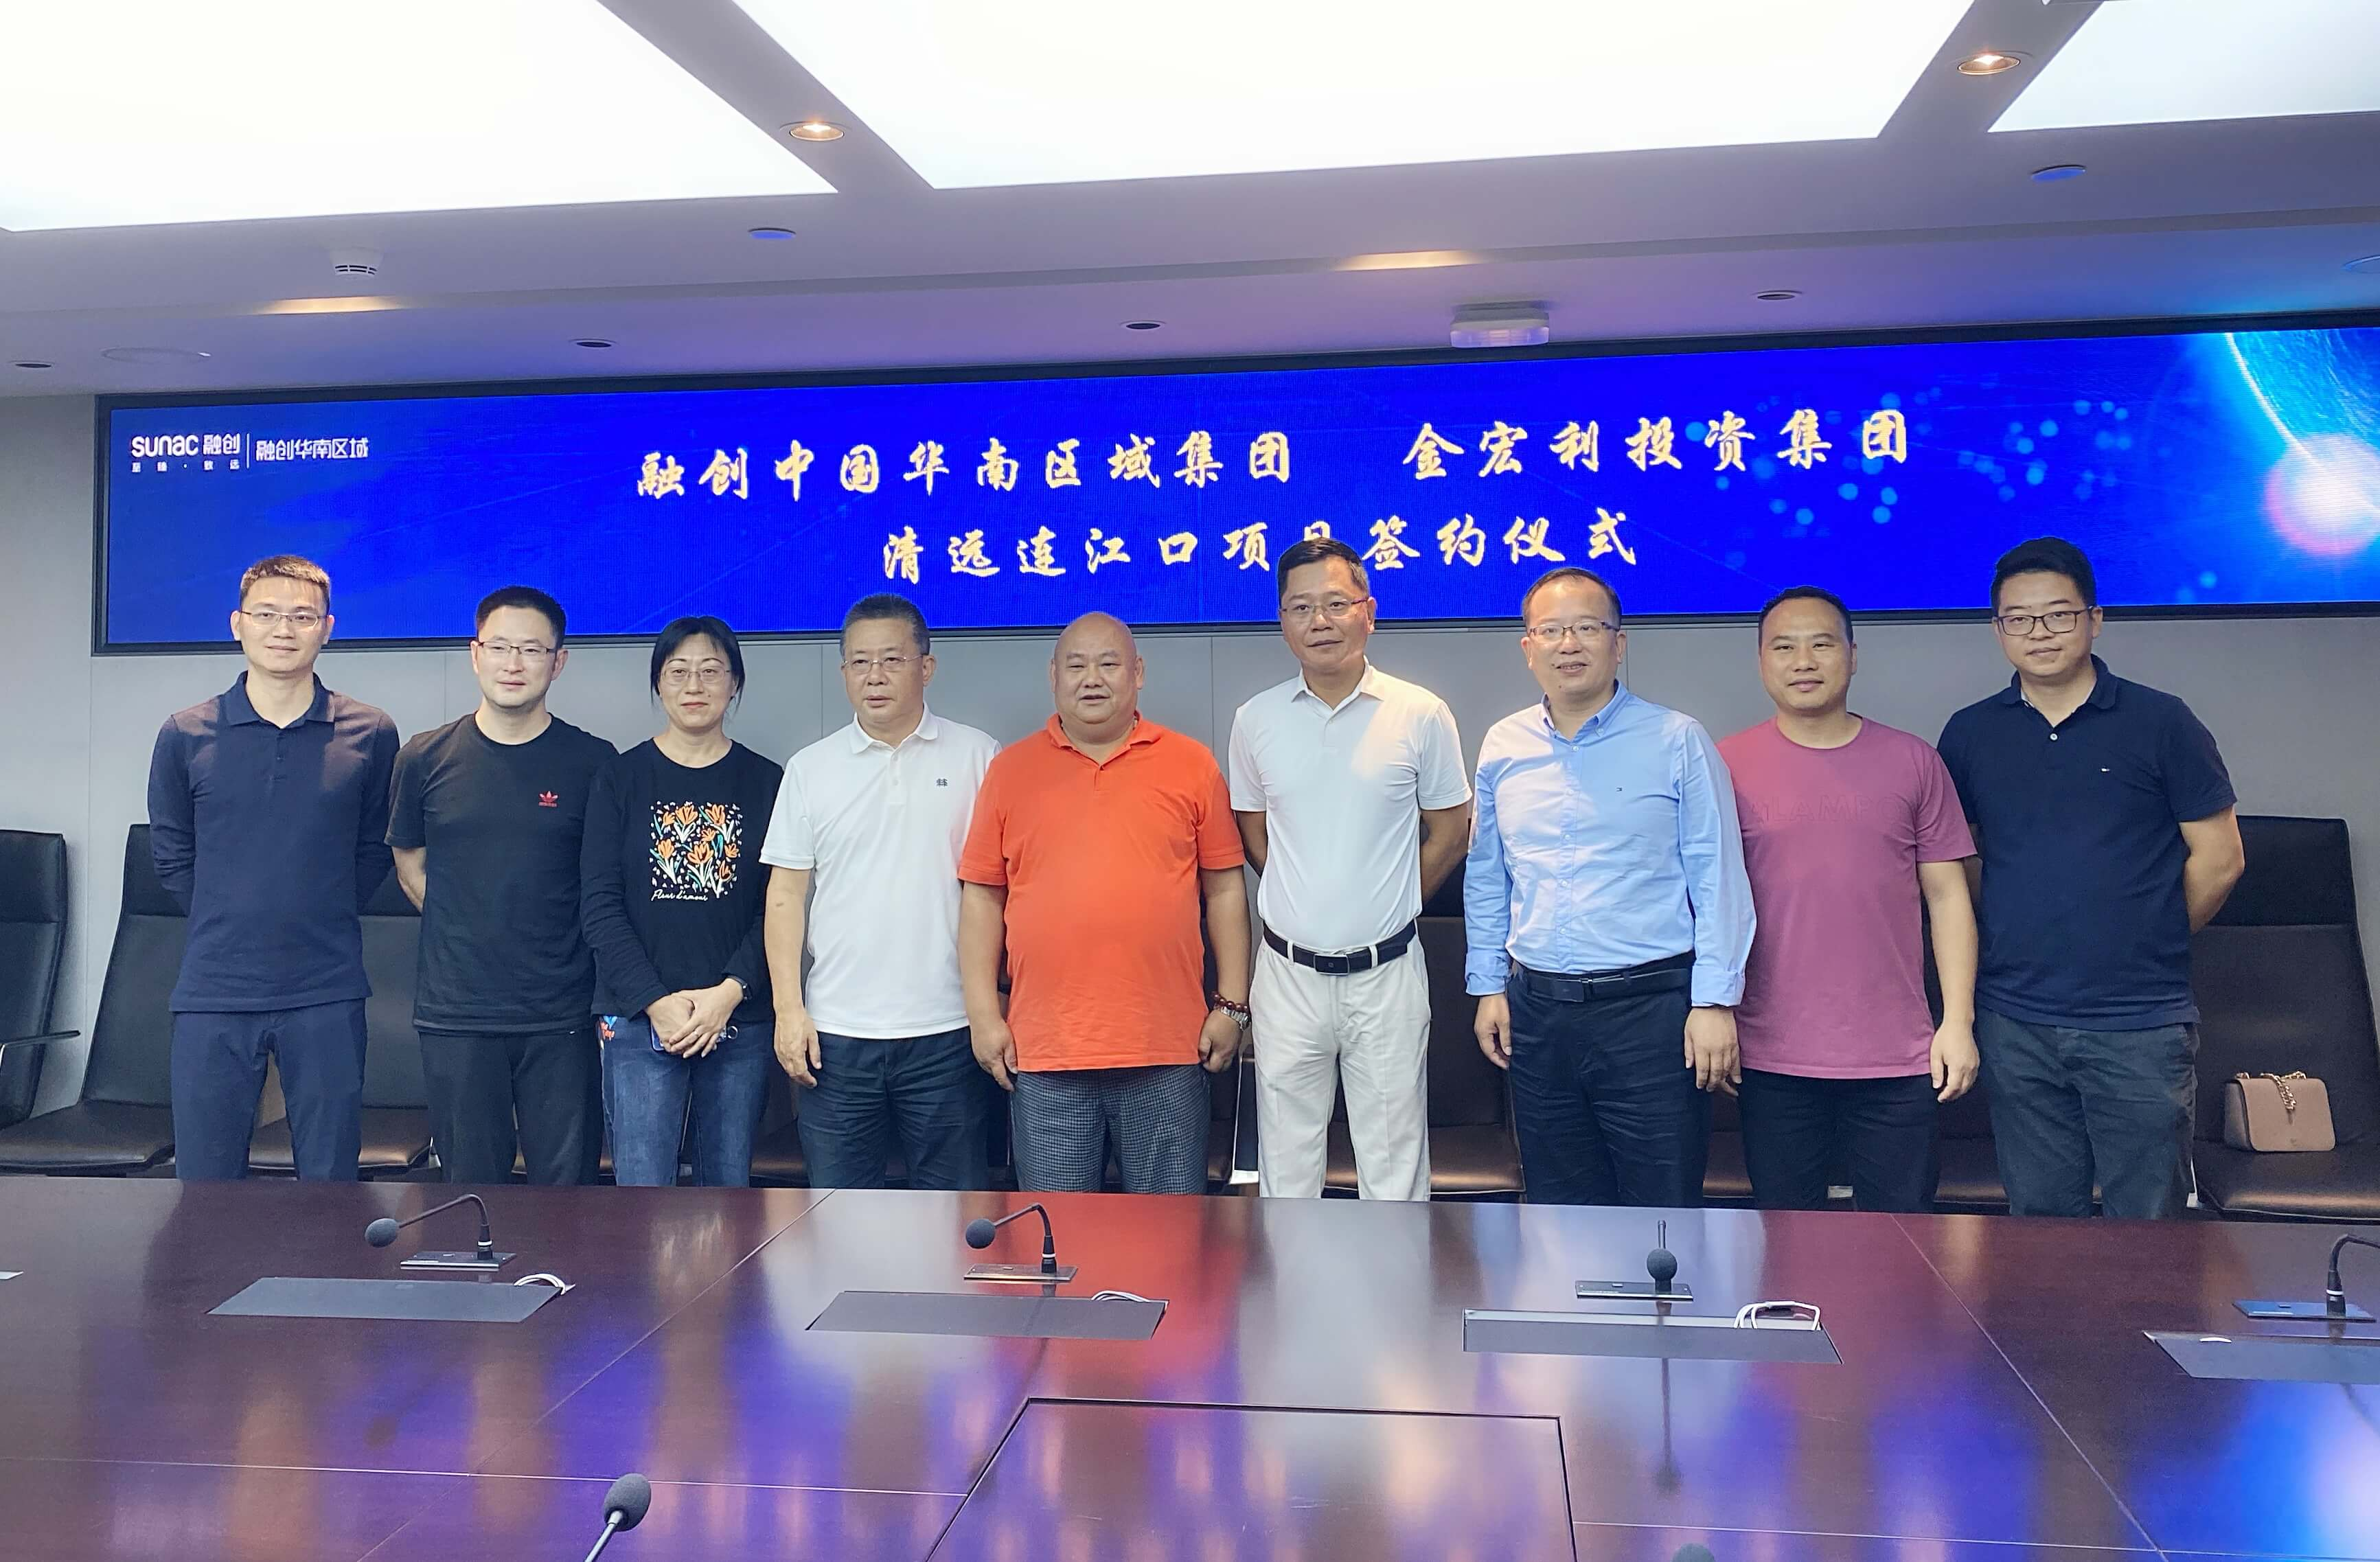 bob官方网站_bob手机登陆_bob网app有限公司金宏利集团与融创中国华南区域集团签订战略合作协议